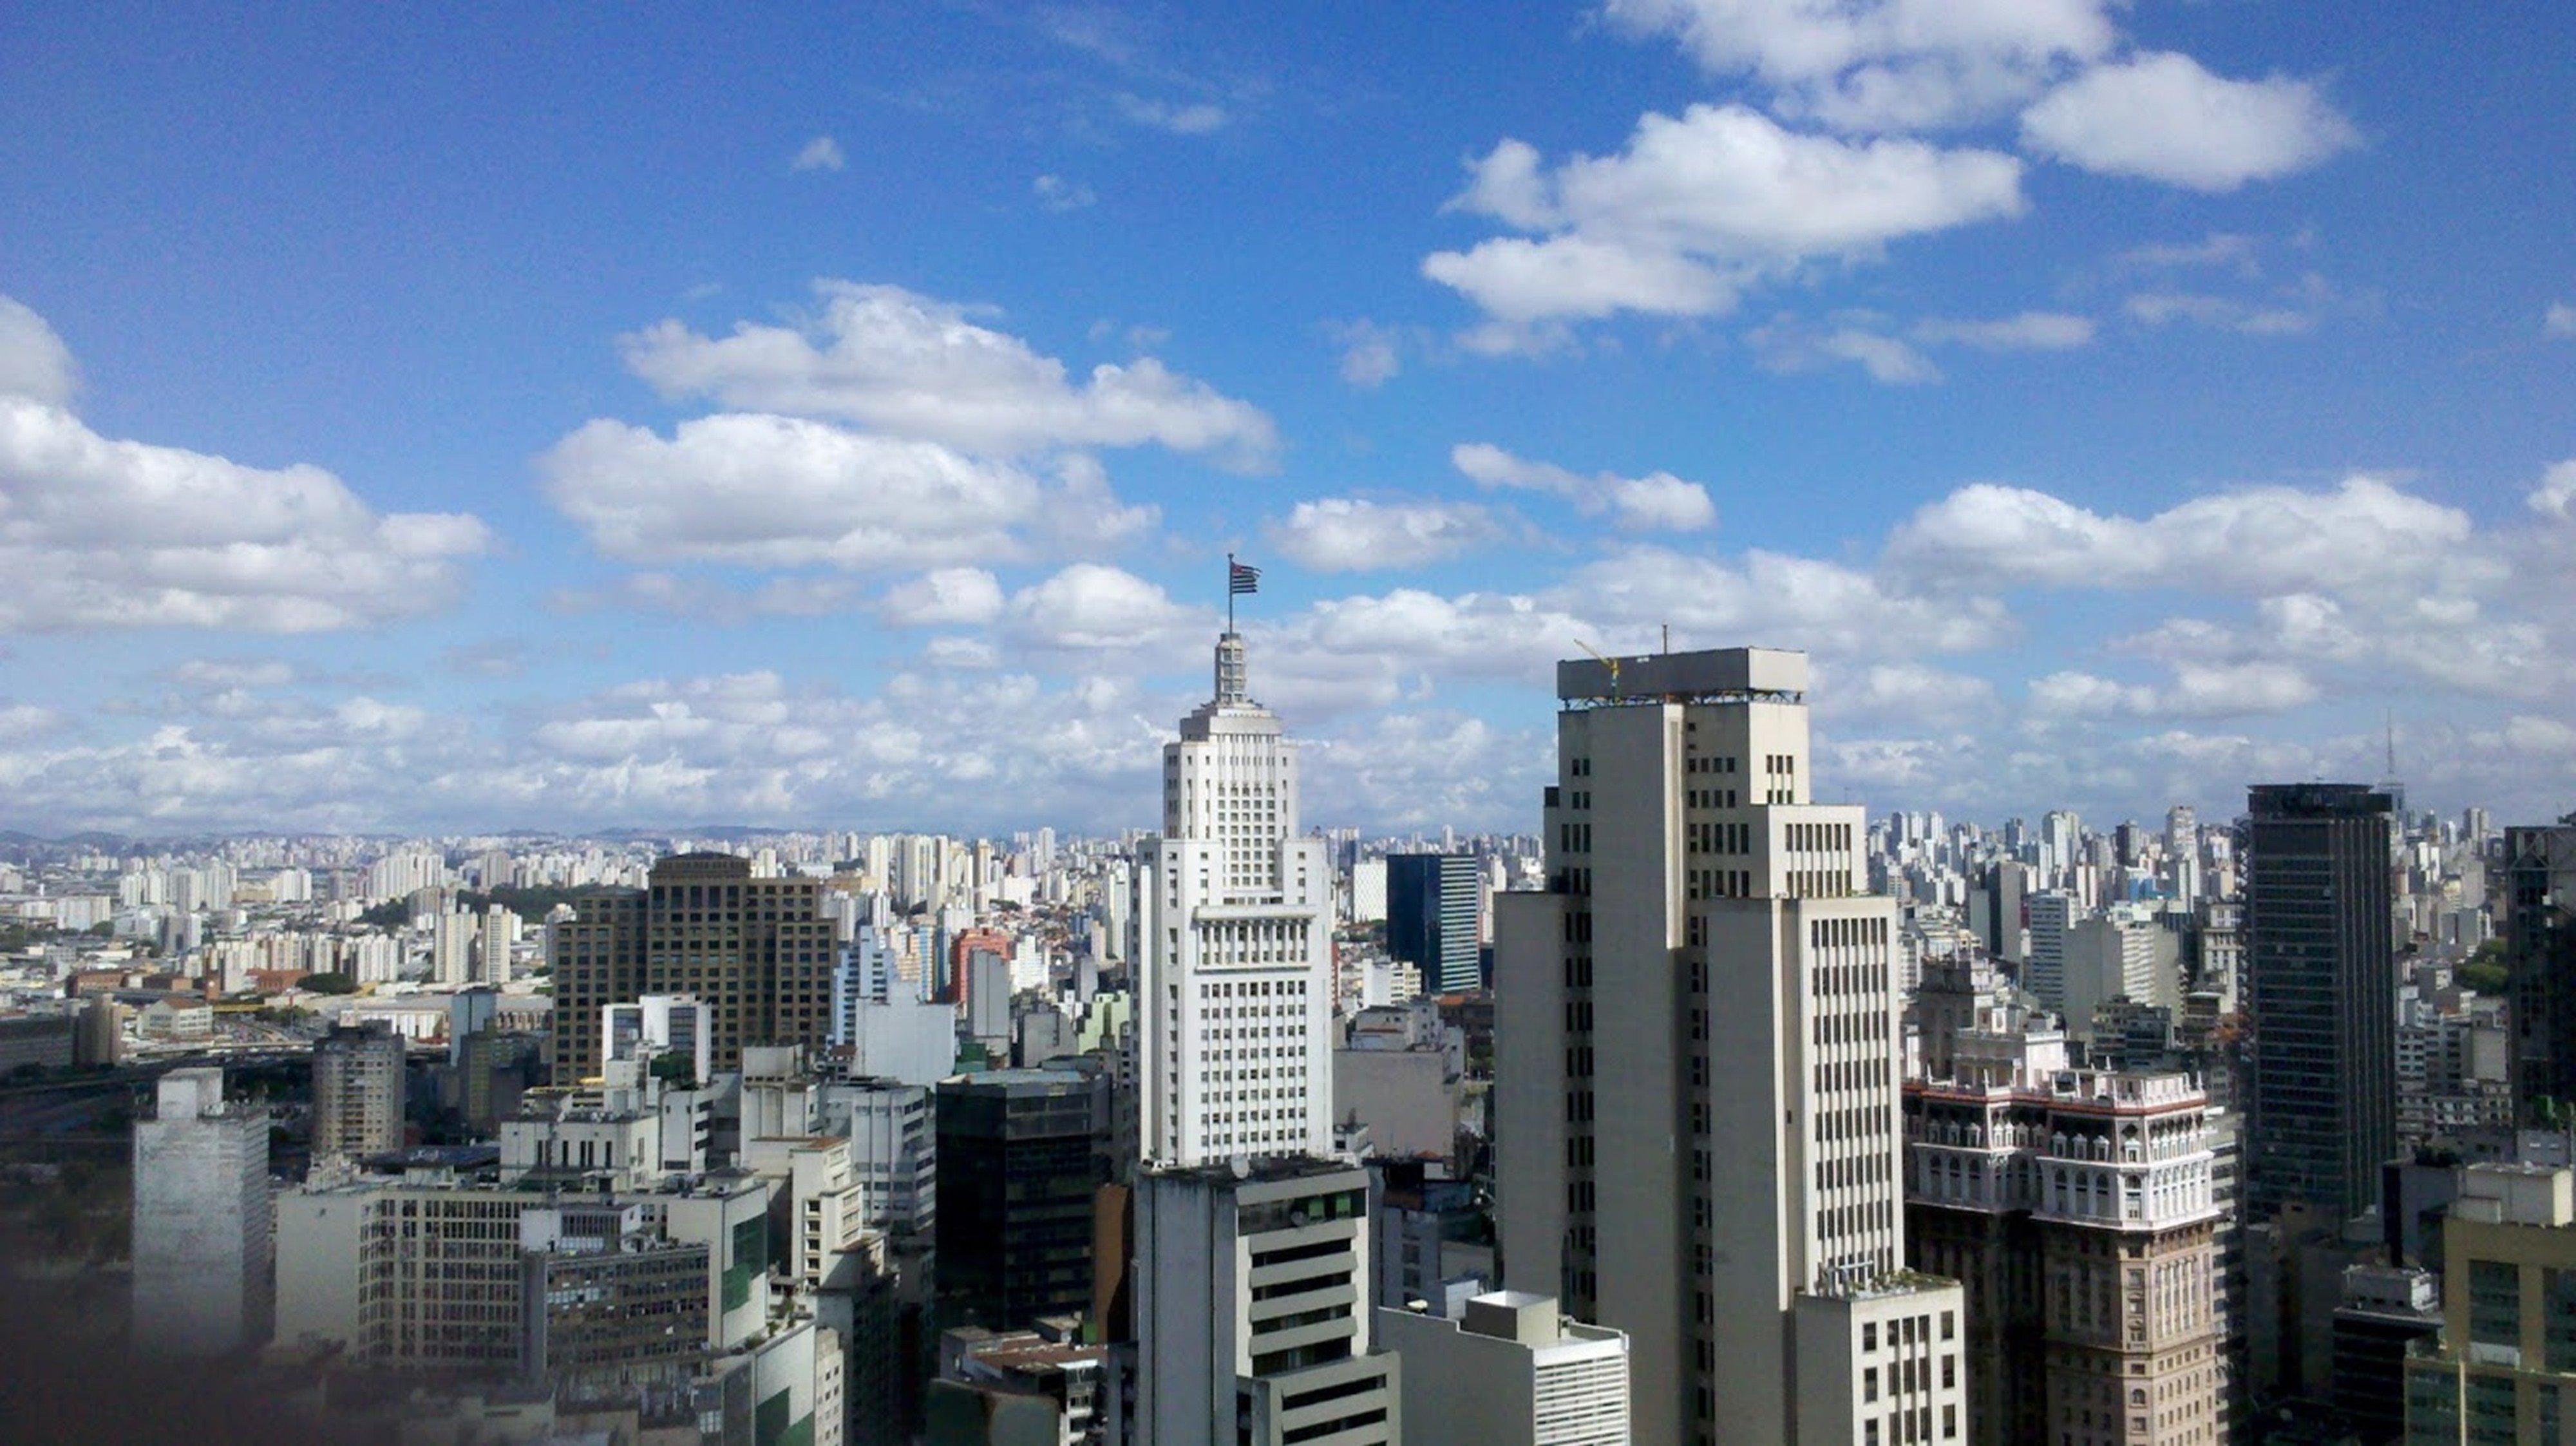 Sky aerial_view building SA wallpaper | 4000x2245 | 342016 | WallpaperUP